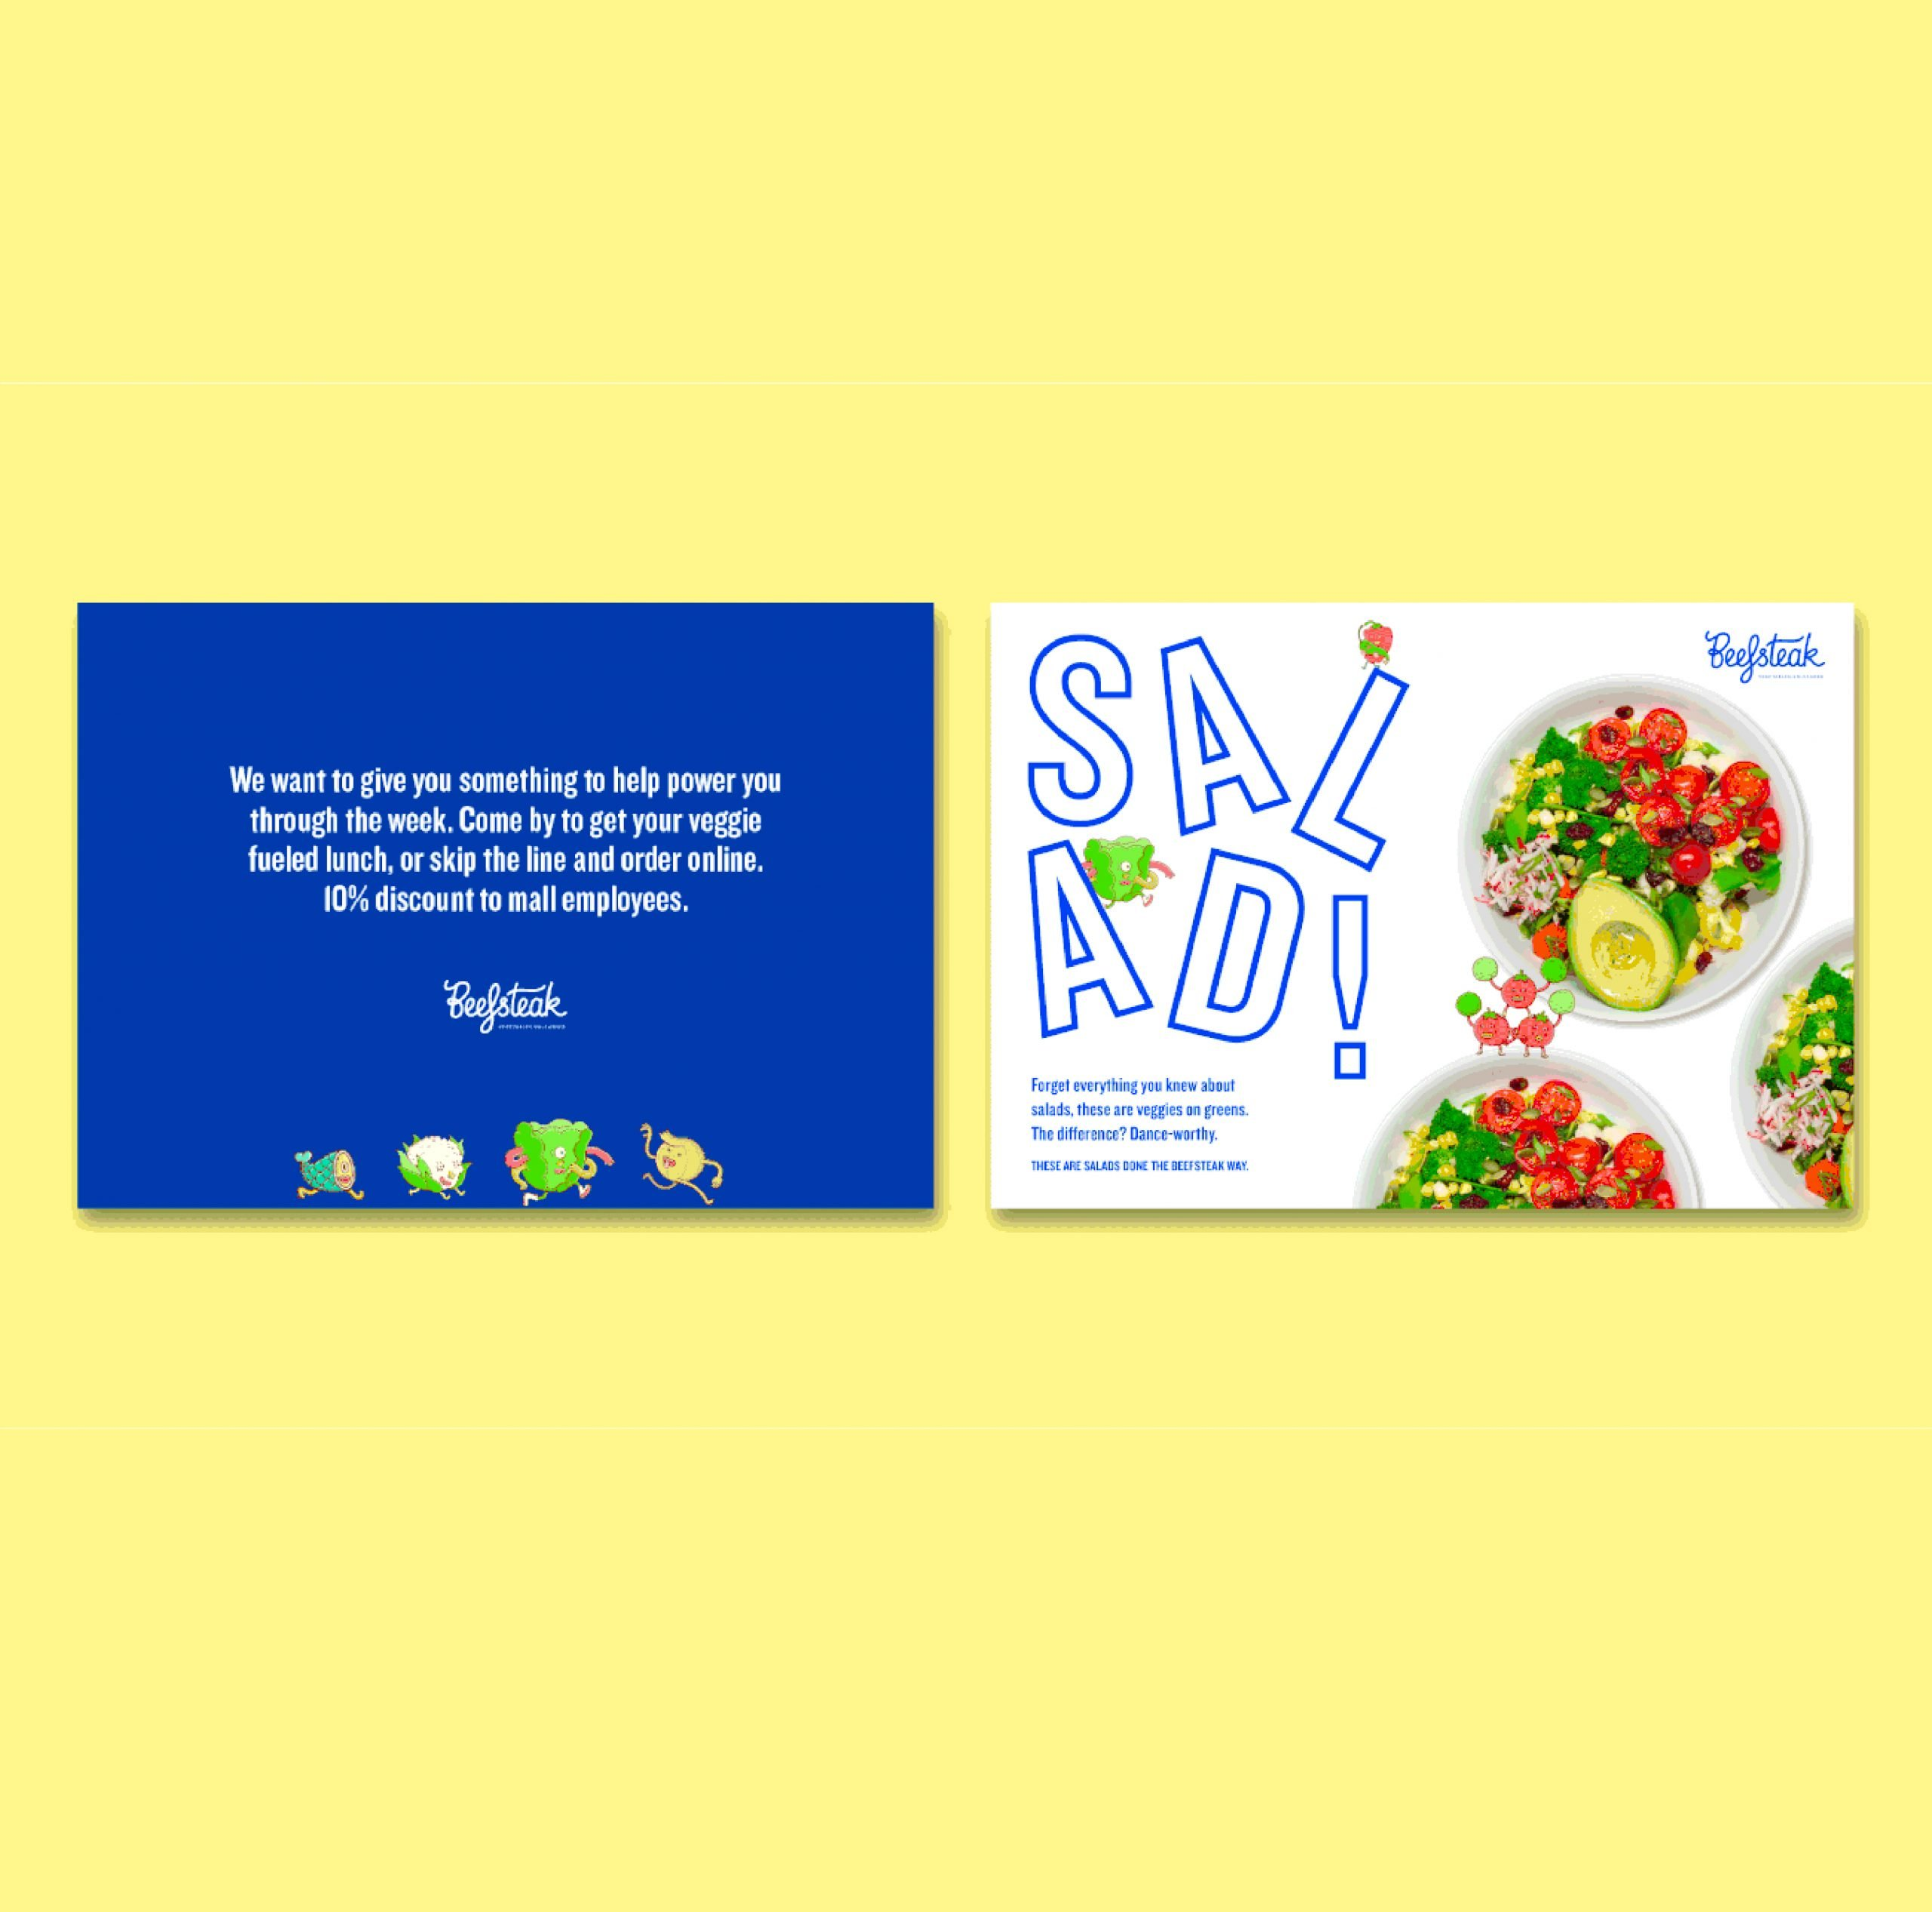 brand strategy on creative marketing materials for Beefsteak restaurants